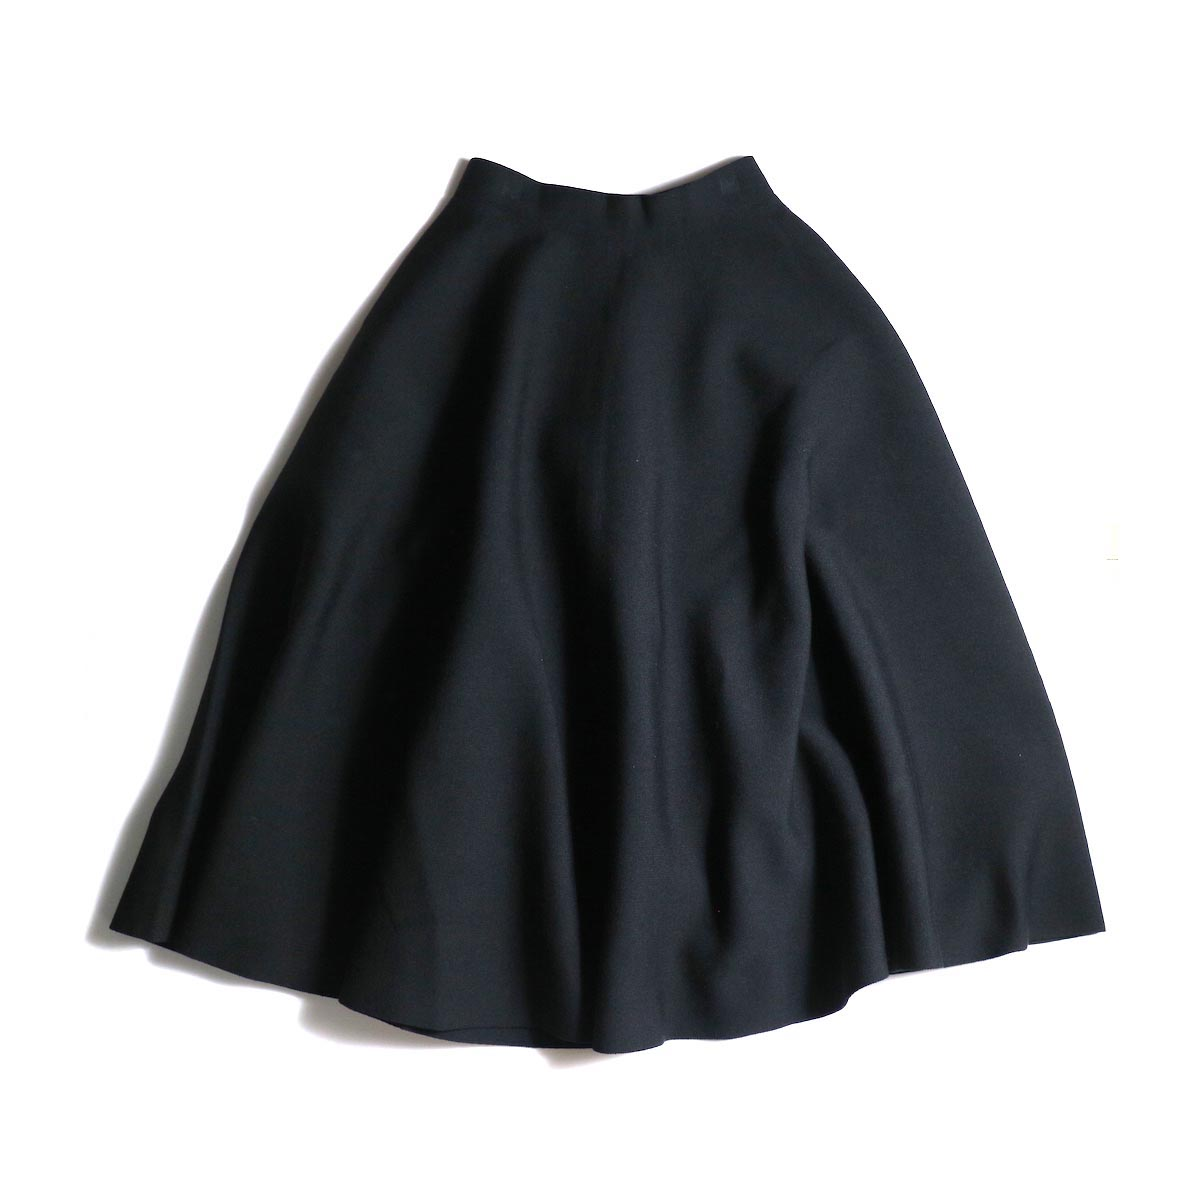 BLUEBIRD BOULEVARD / ミラノリブニットスカート (Black)正面